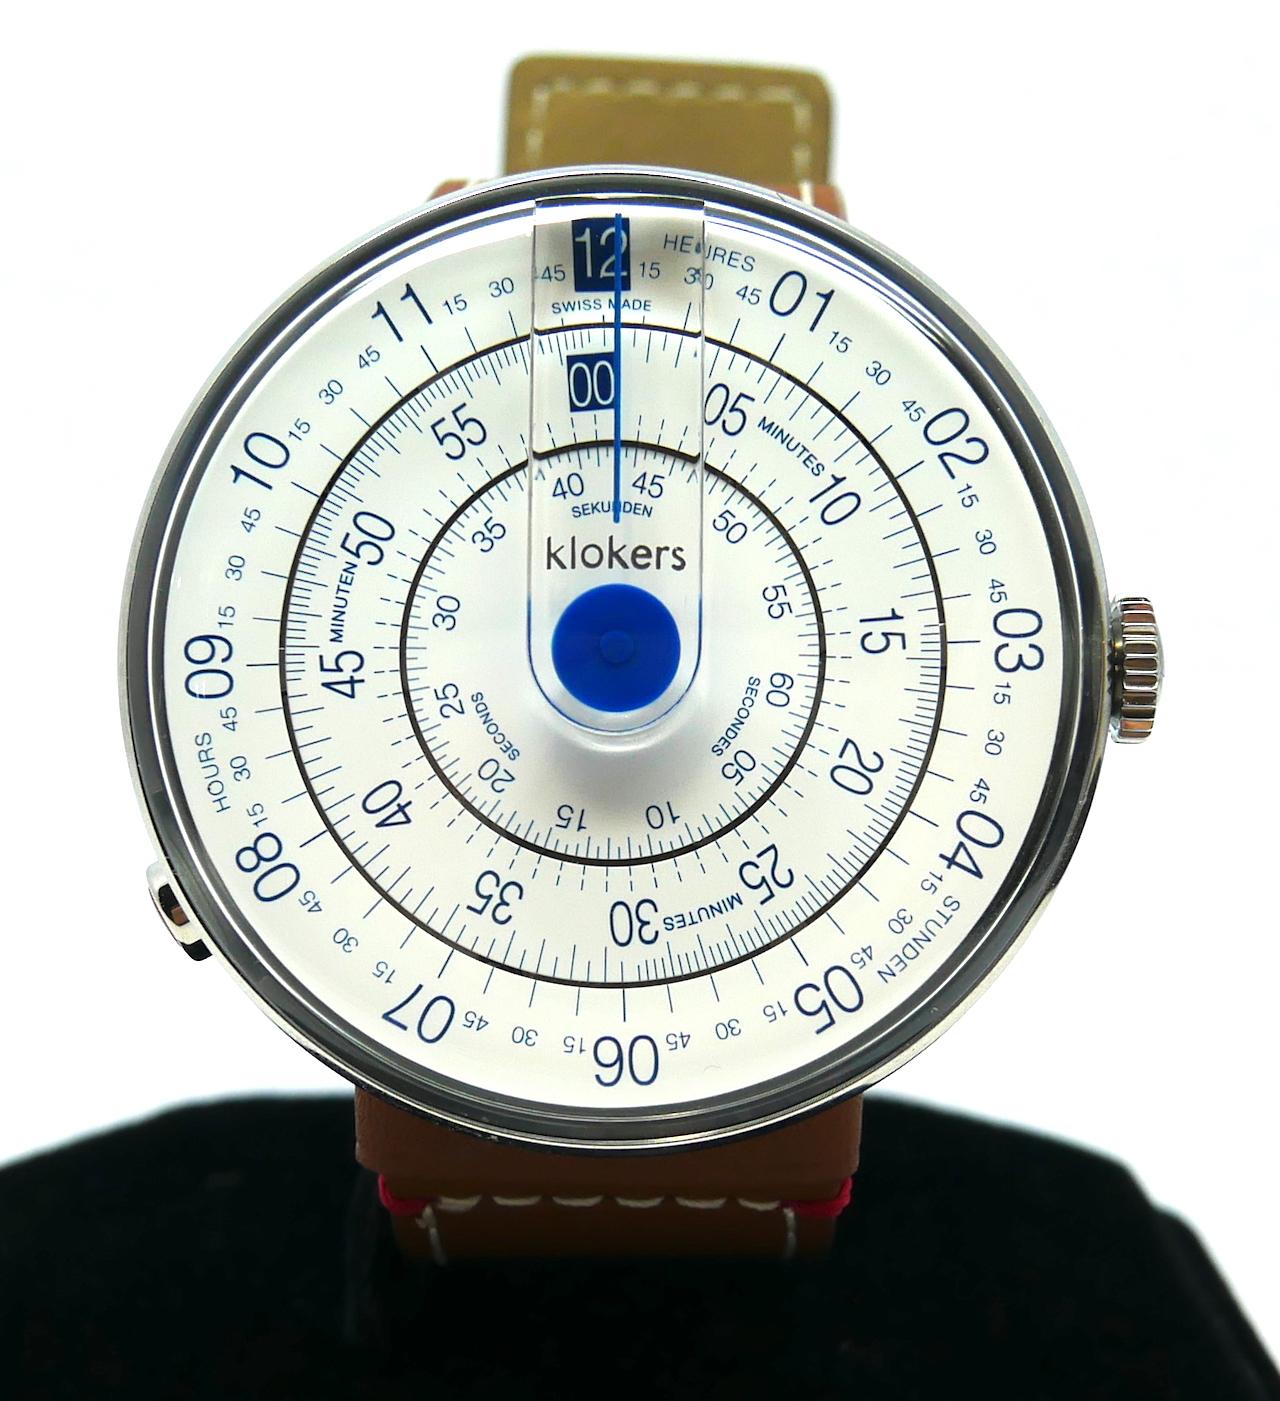 Klokers Klok-01-D4 Stainless Steel (BNIB) | GR Luxury-Singapore Rolex Reliable Watch Dealer